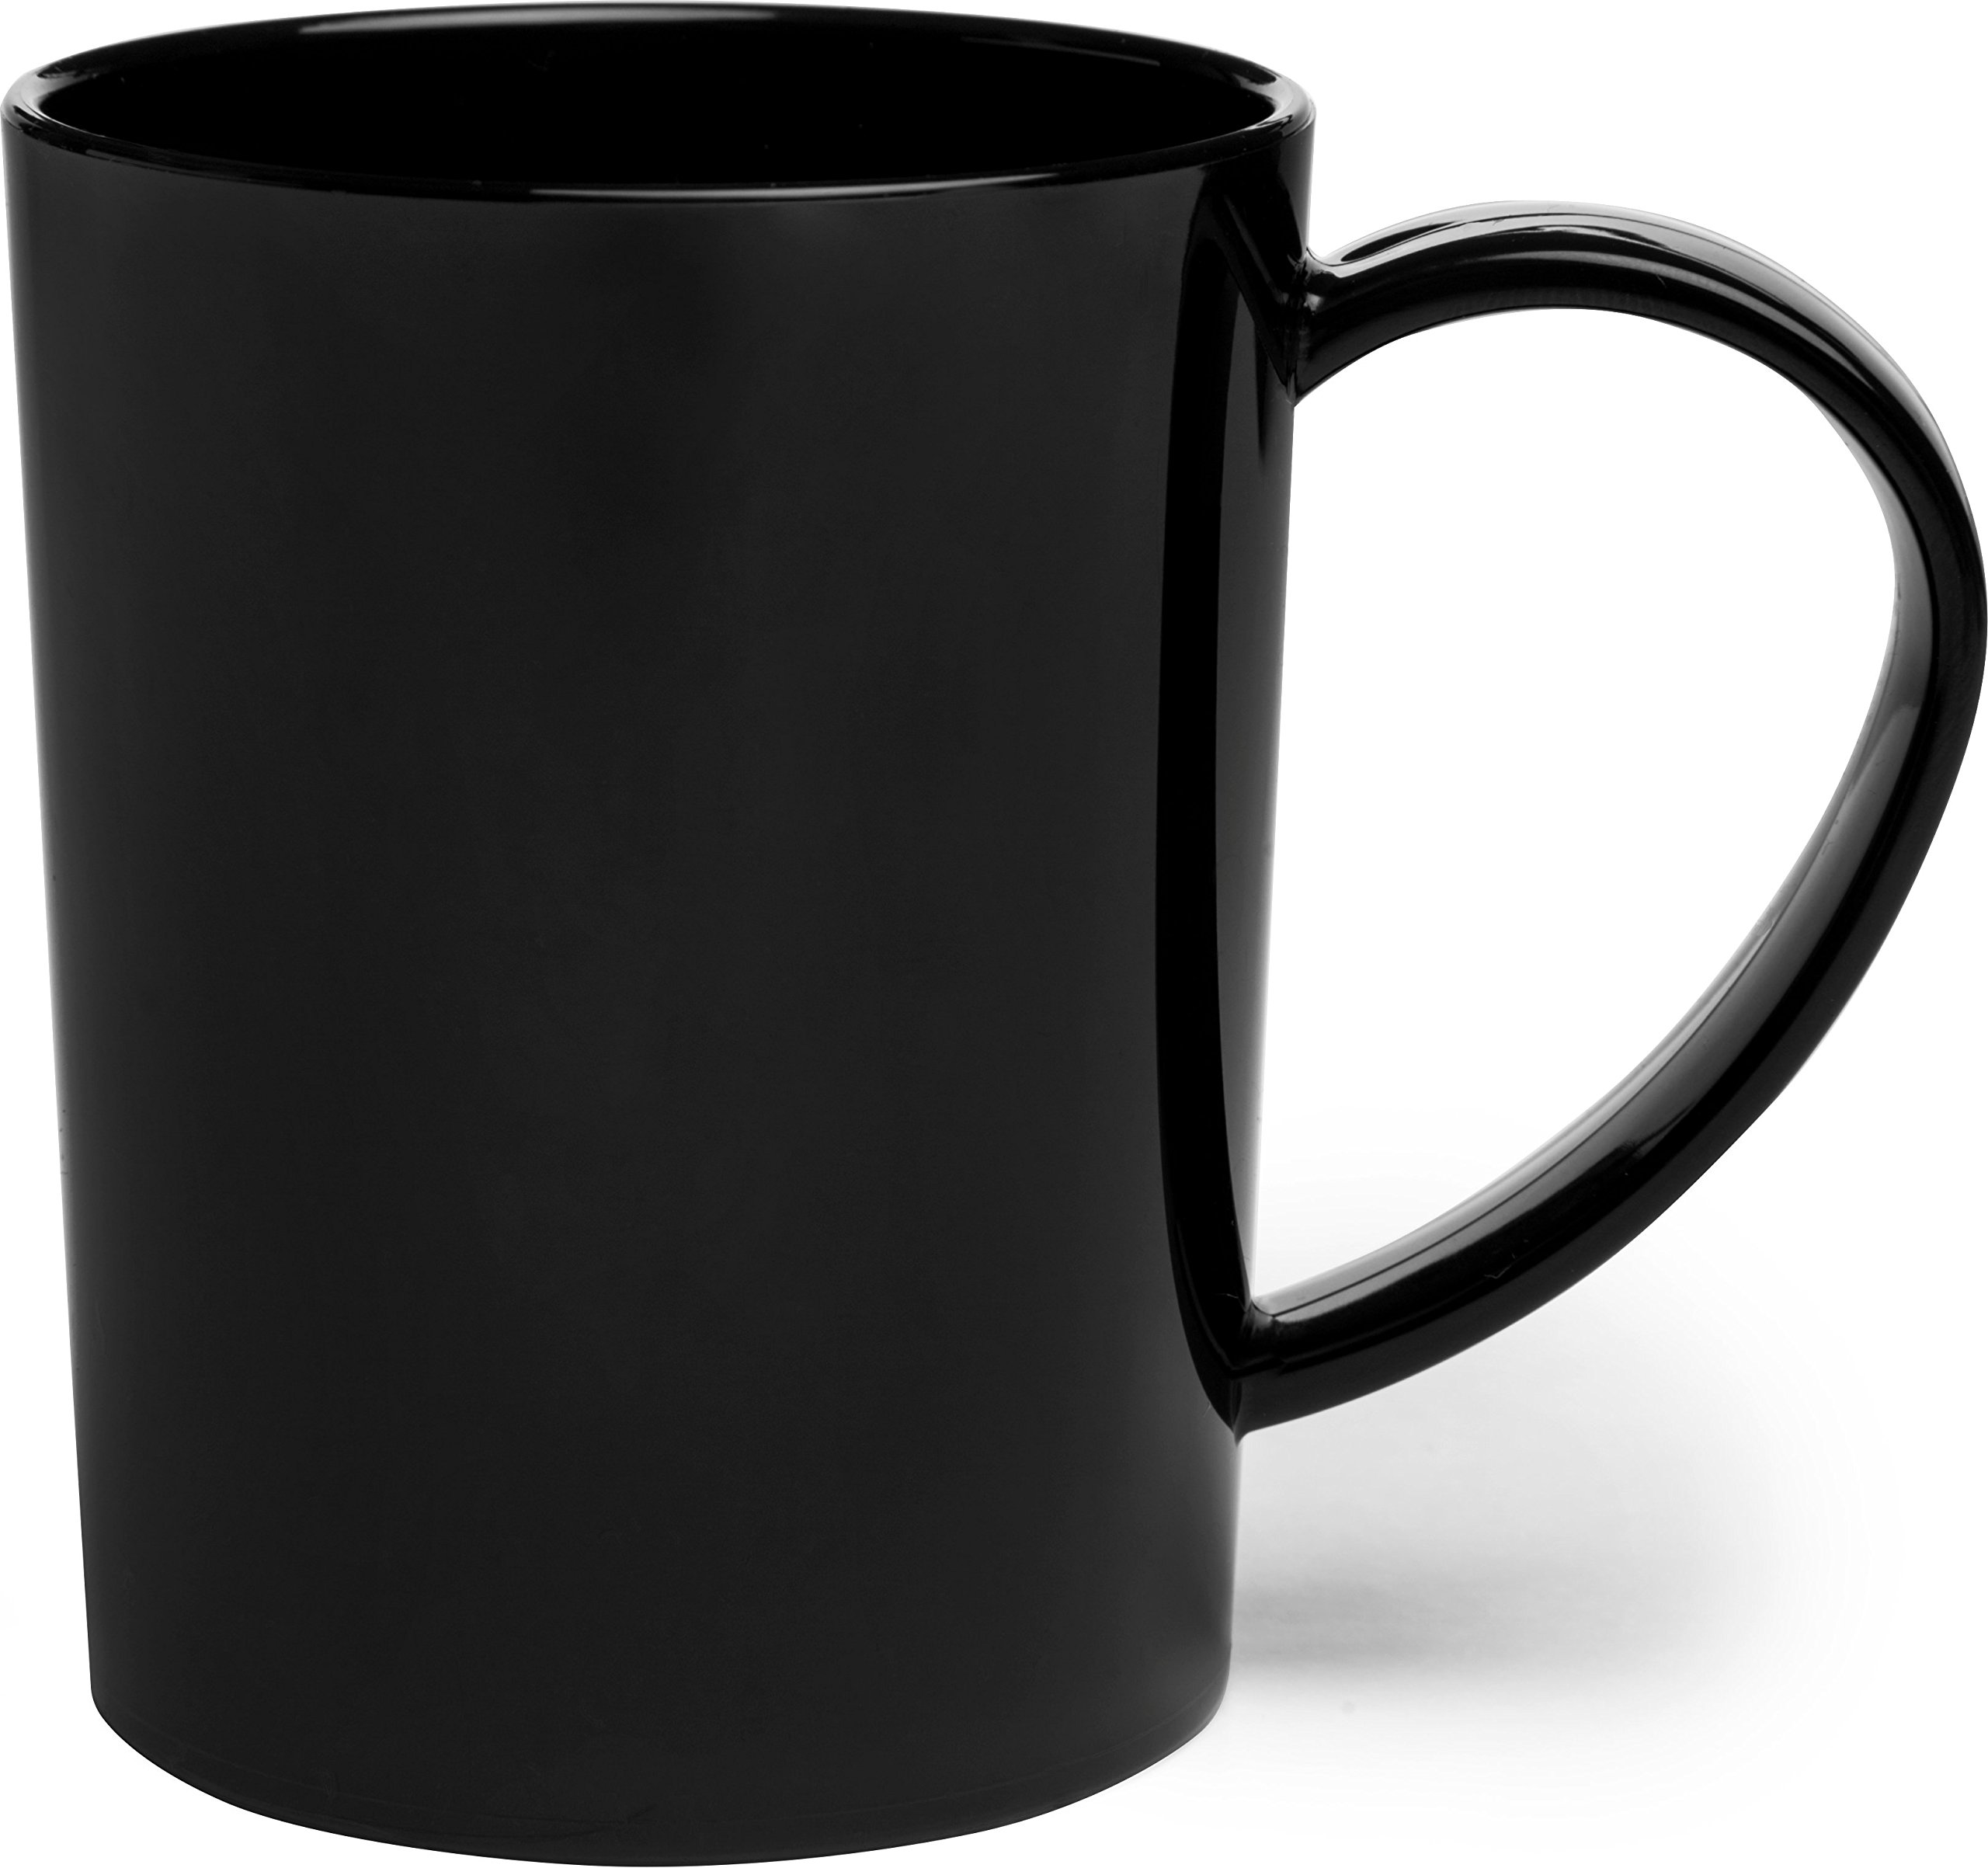 Carlisle 4306603 Break-Resistant Tritan Coffee Mug, 8 oz, Black (Pack of 12)